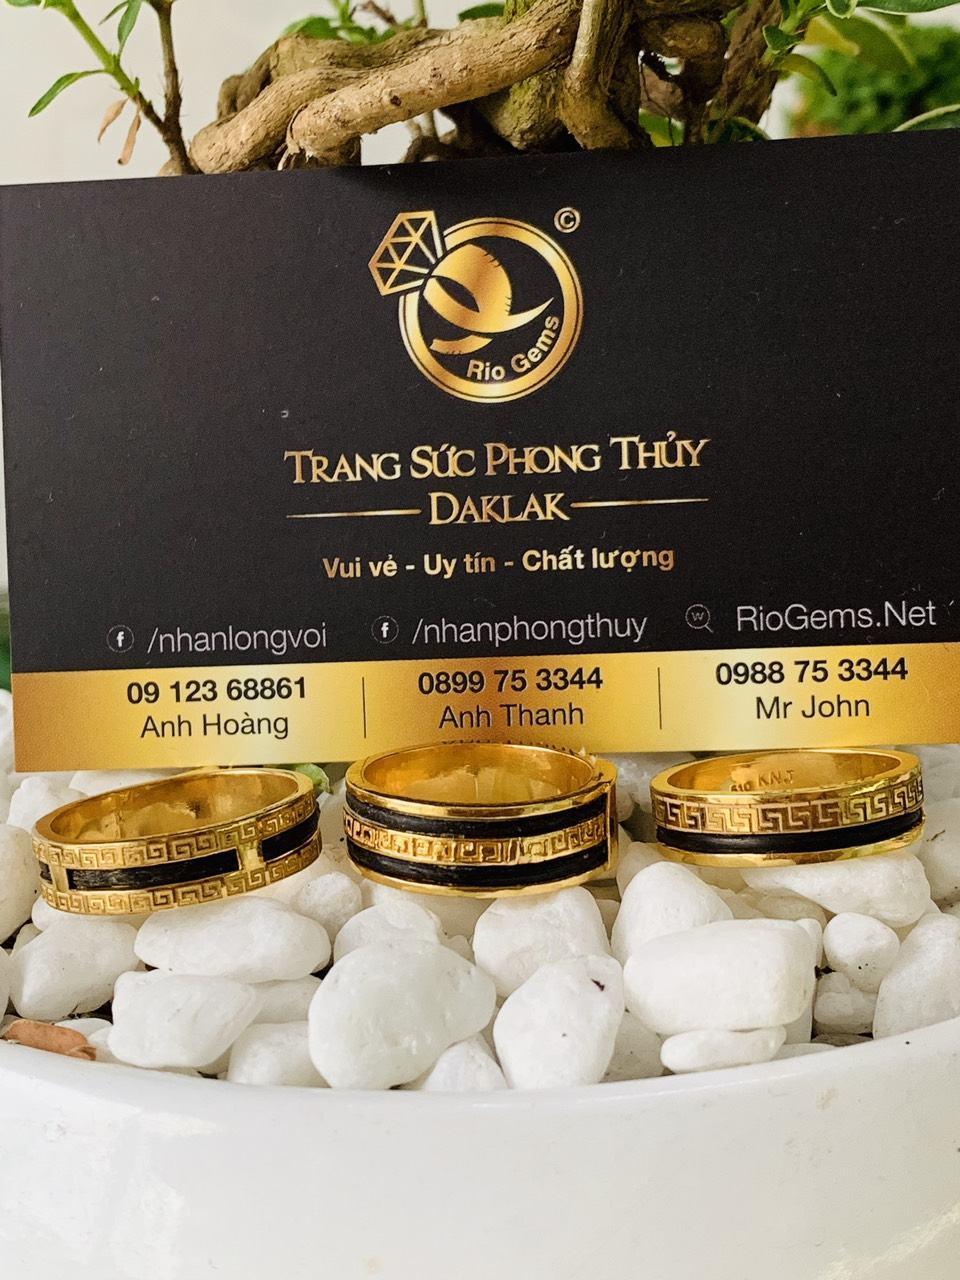 nhan long voi chay hoa van vang phong thuy riogems (2)